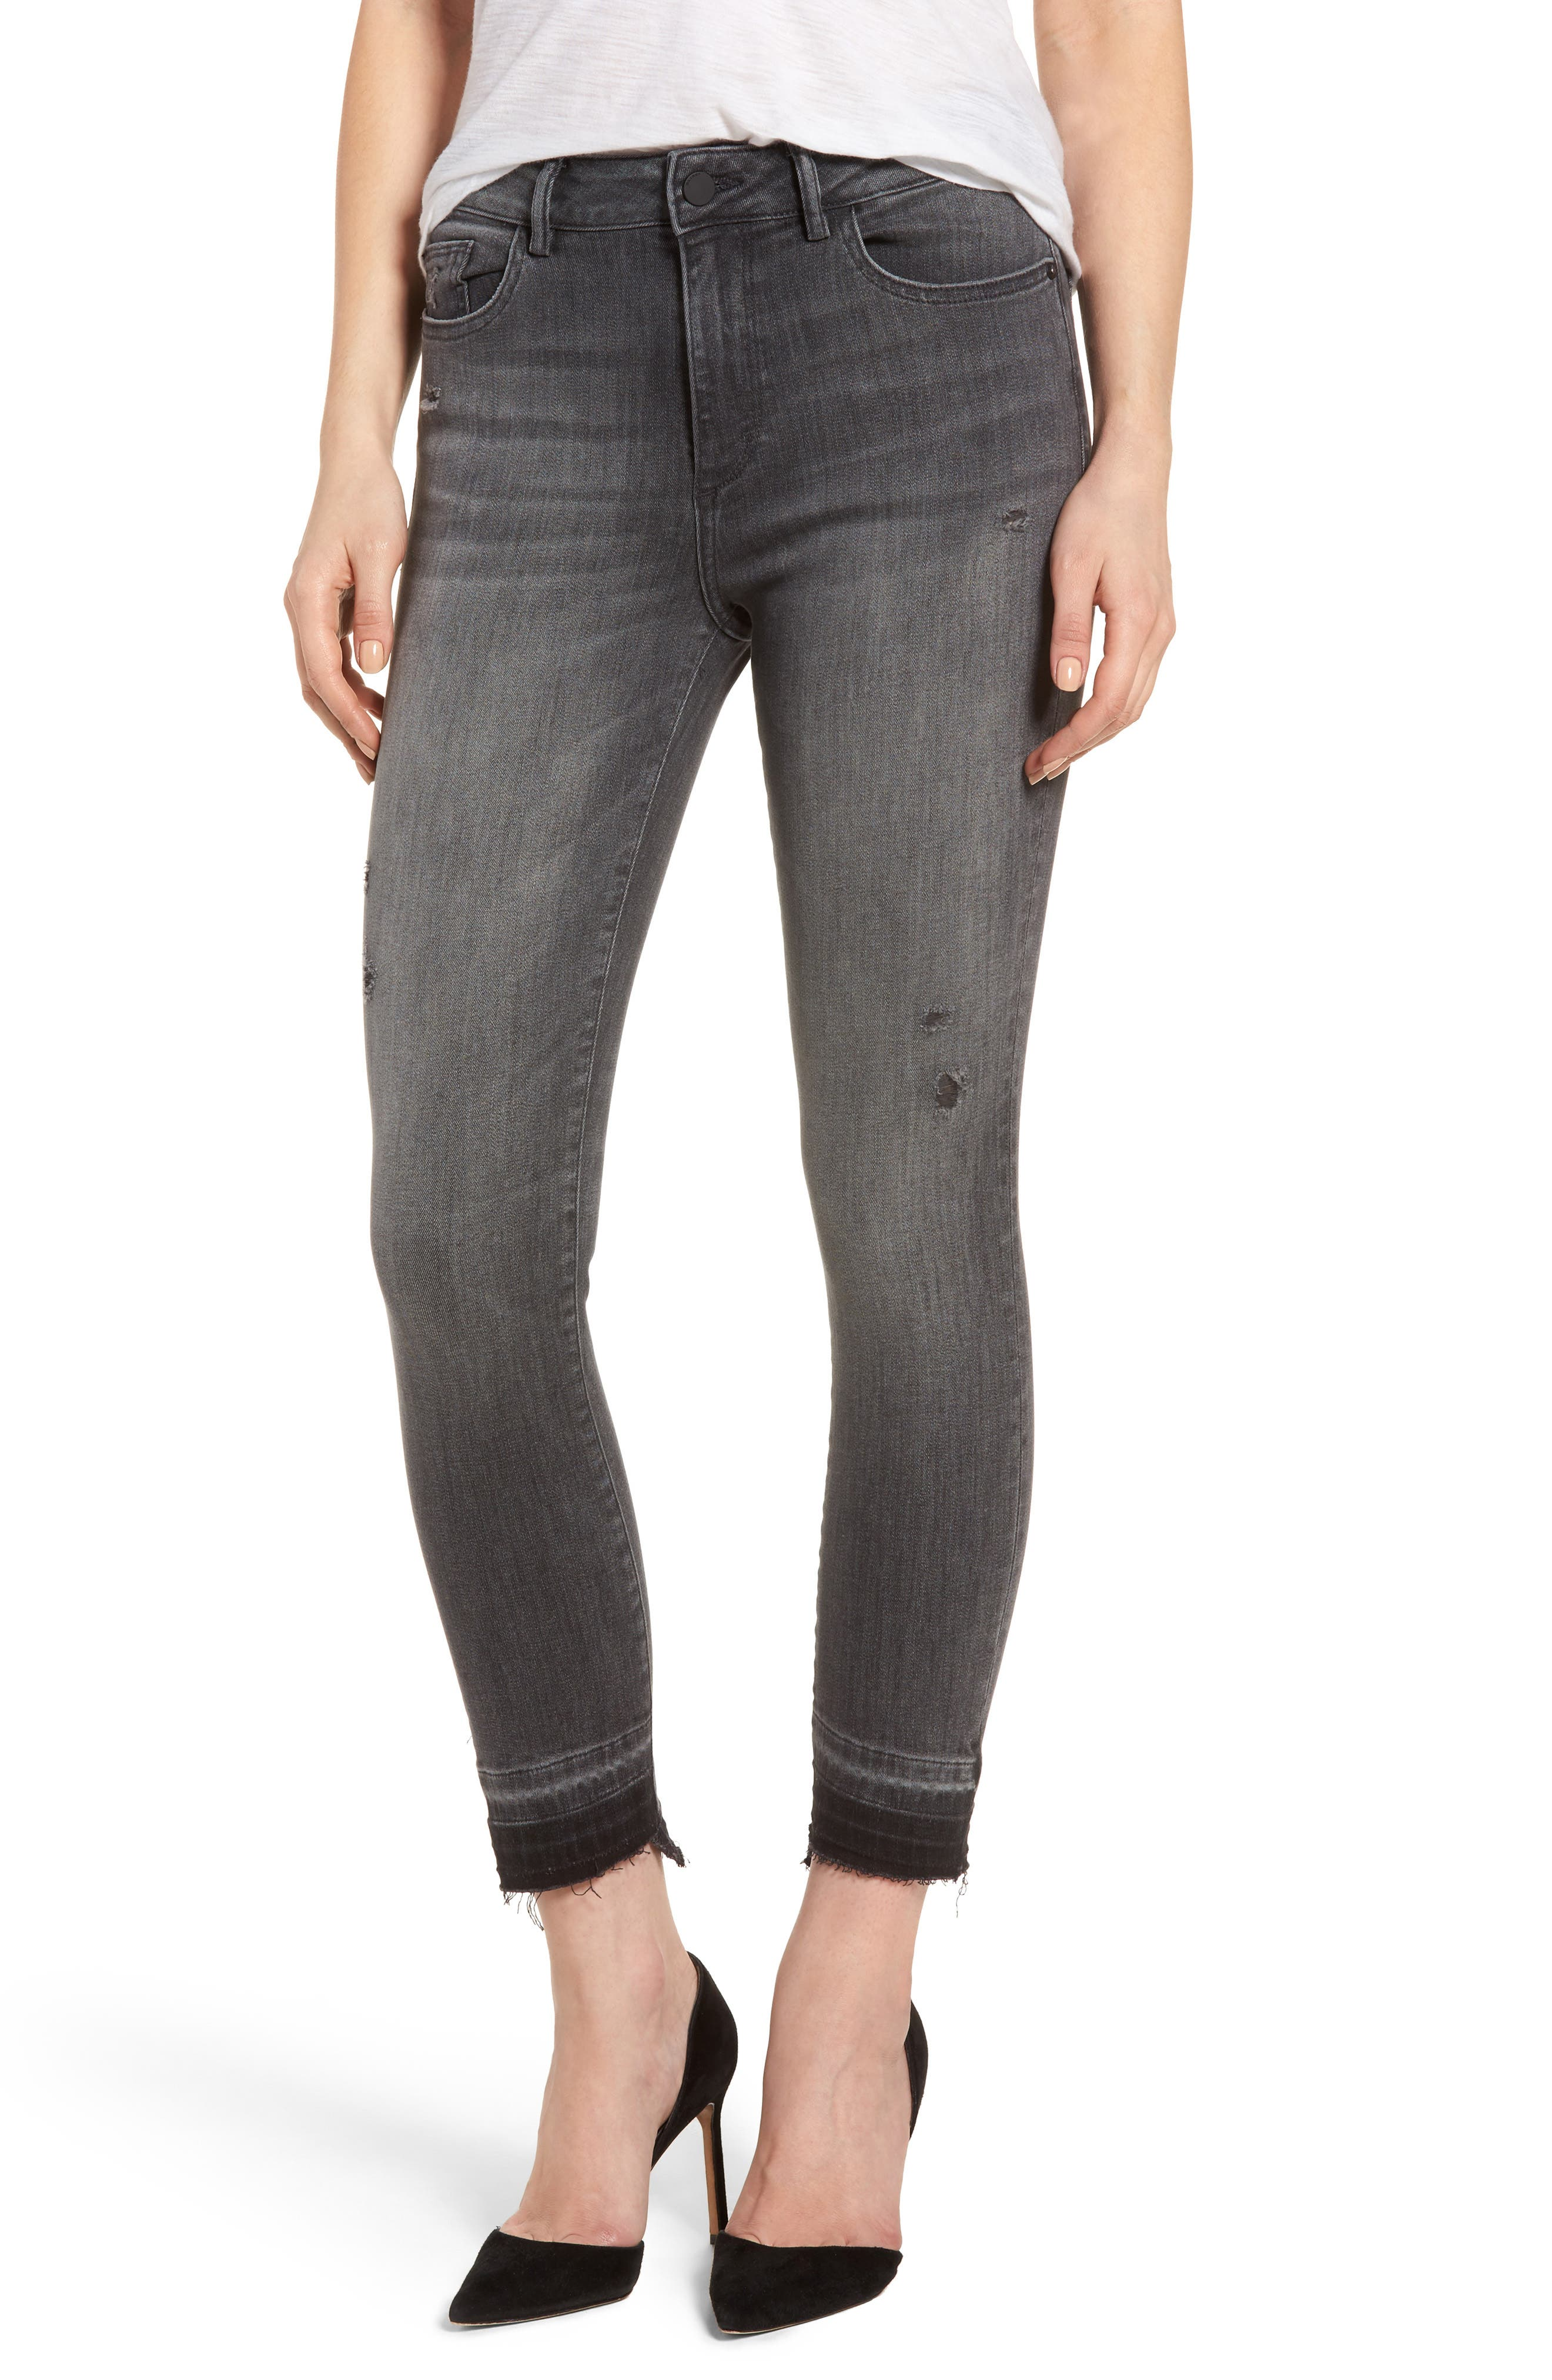 Farrow High Waist Instaslim Skinny Jeans,                         Main,                         color, 020